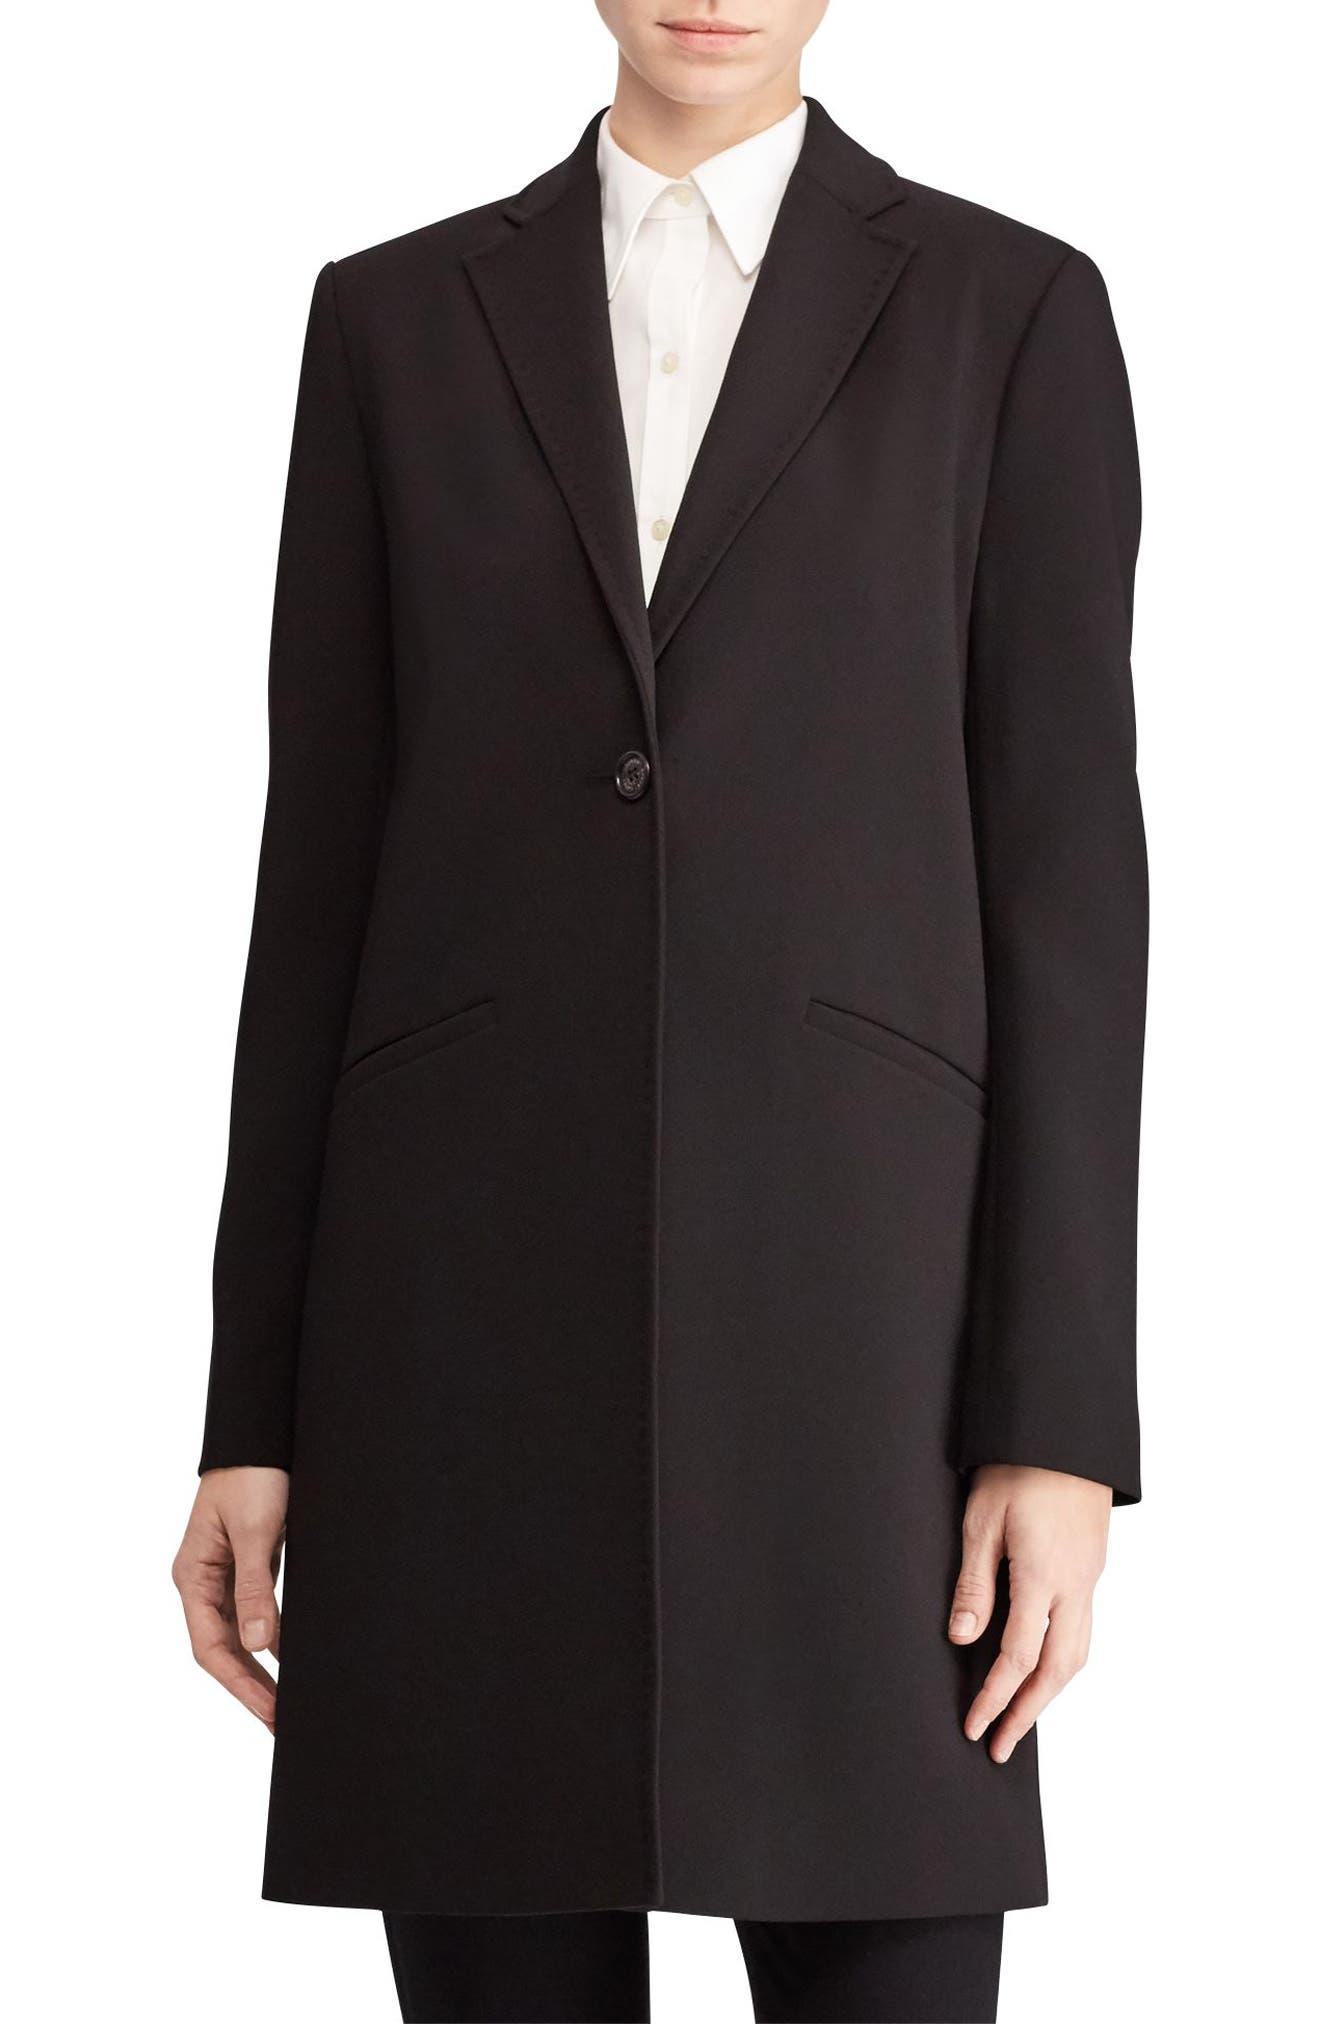 Alternate Image 1 Selected - Lauren Ralph Lauren Crepe Reefer Coat (Petite)